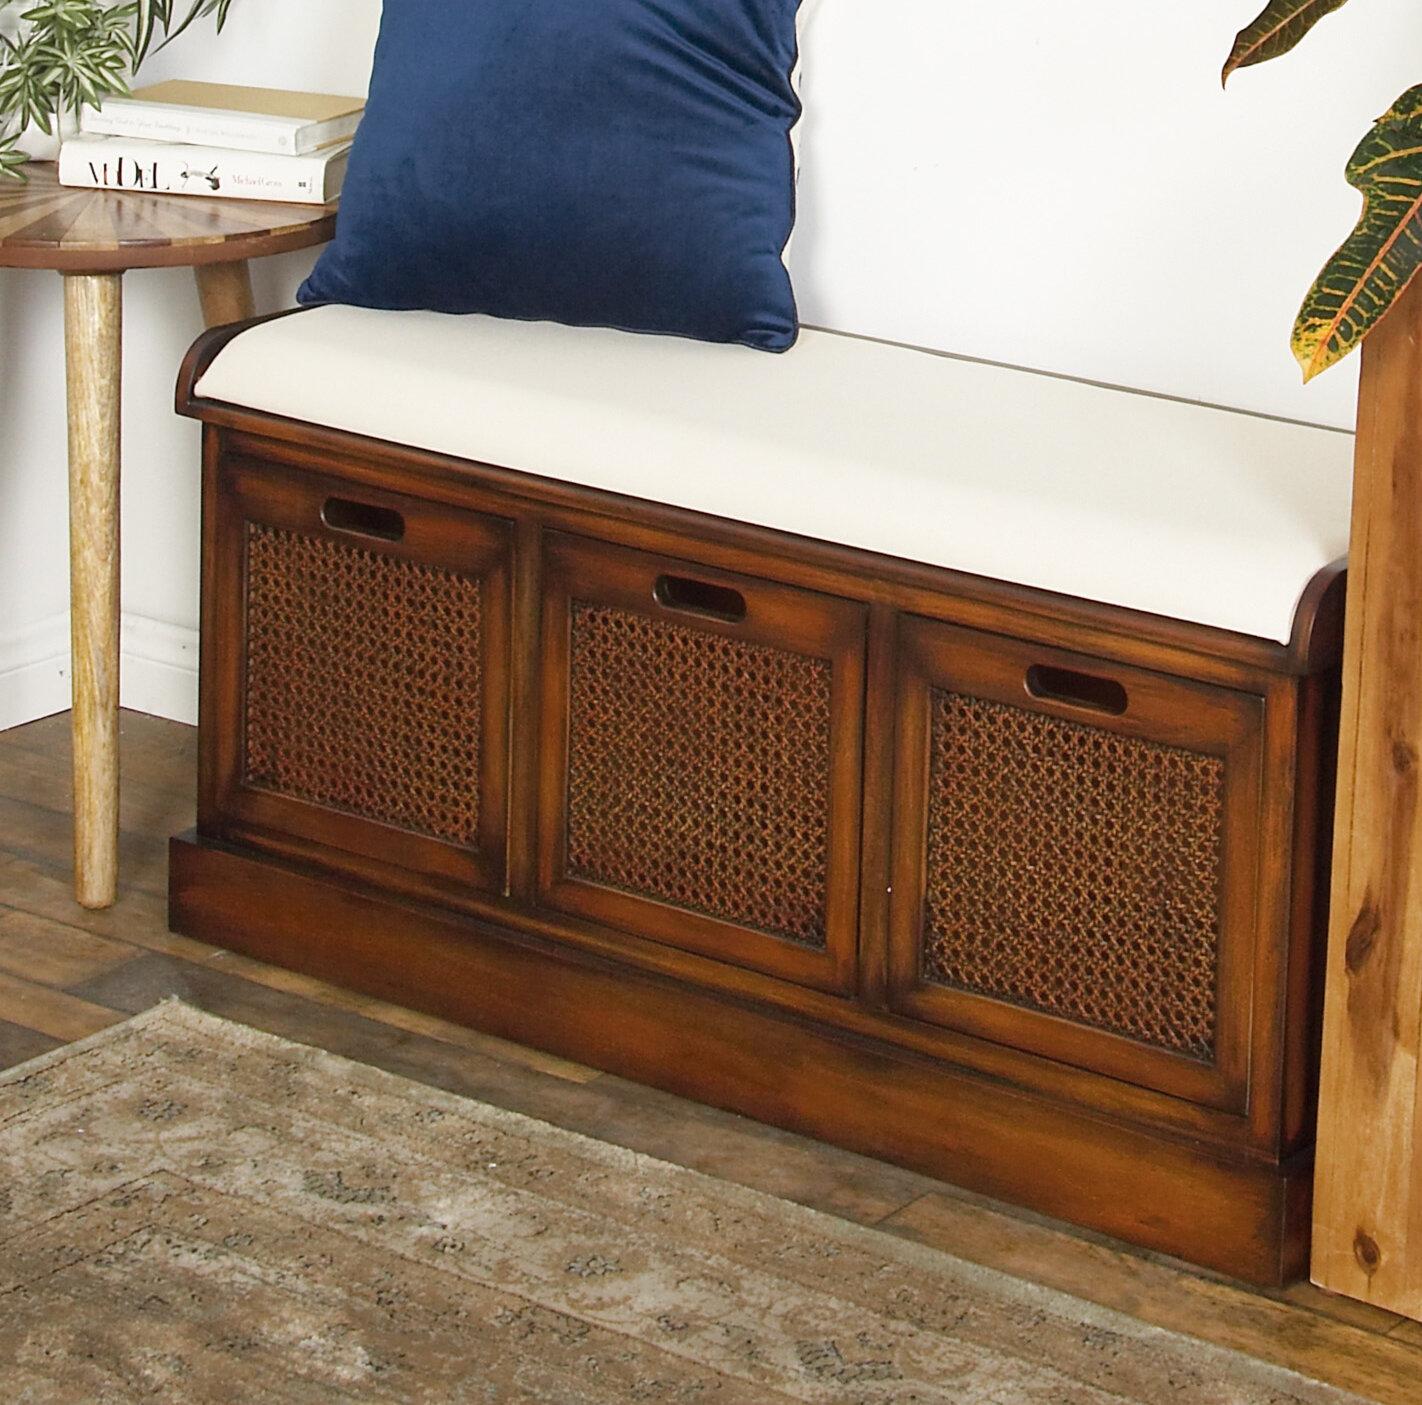 Tremendous Bayou Breeze Harrisburg Rustic 3 Drawer Upholstered Storage Cjindustries Chair Design For Home Cjindustriesco